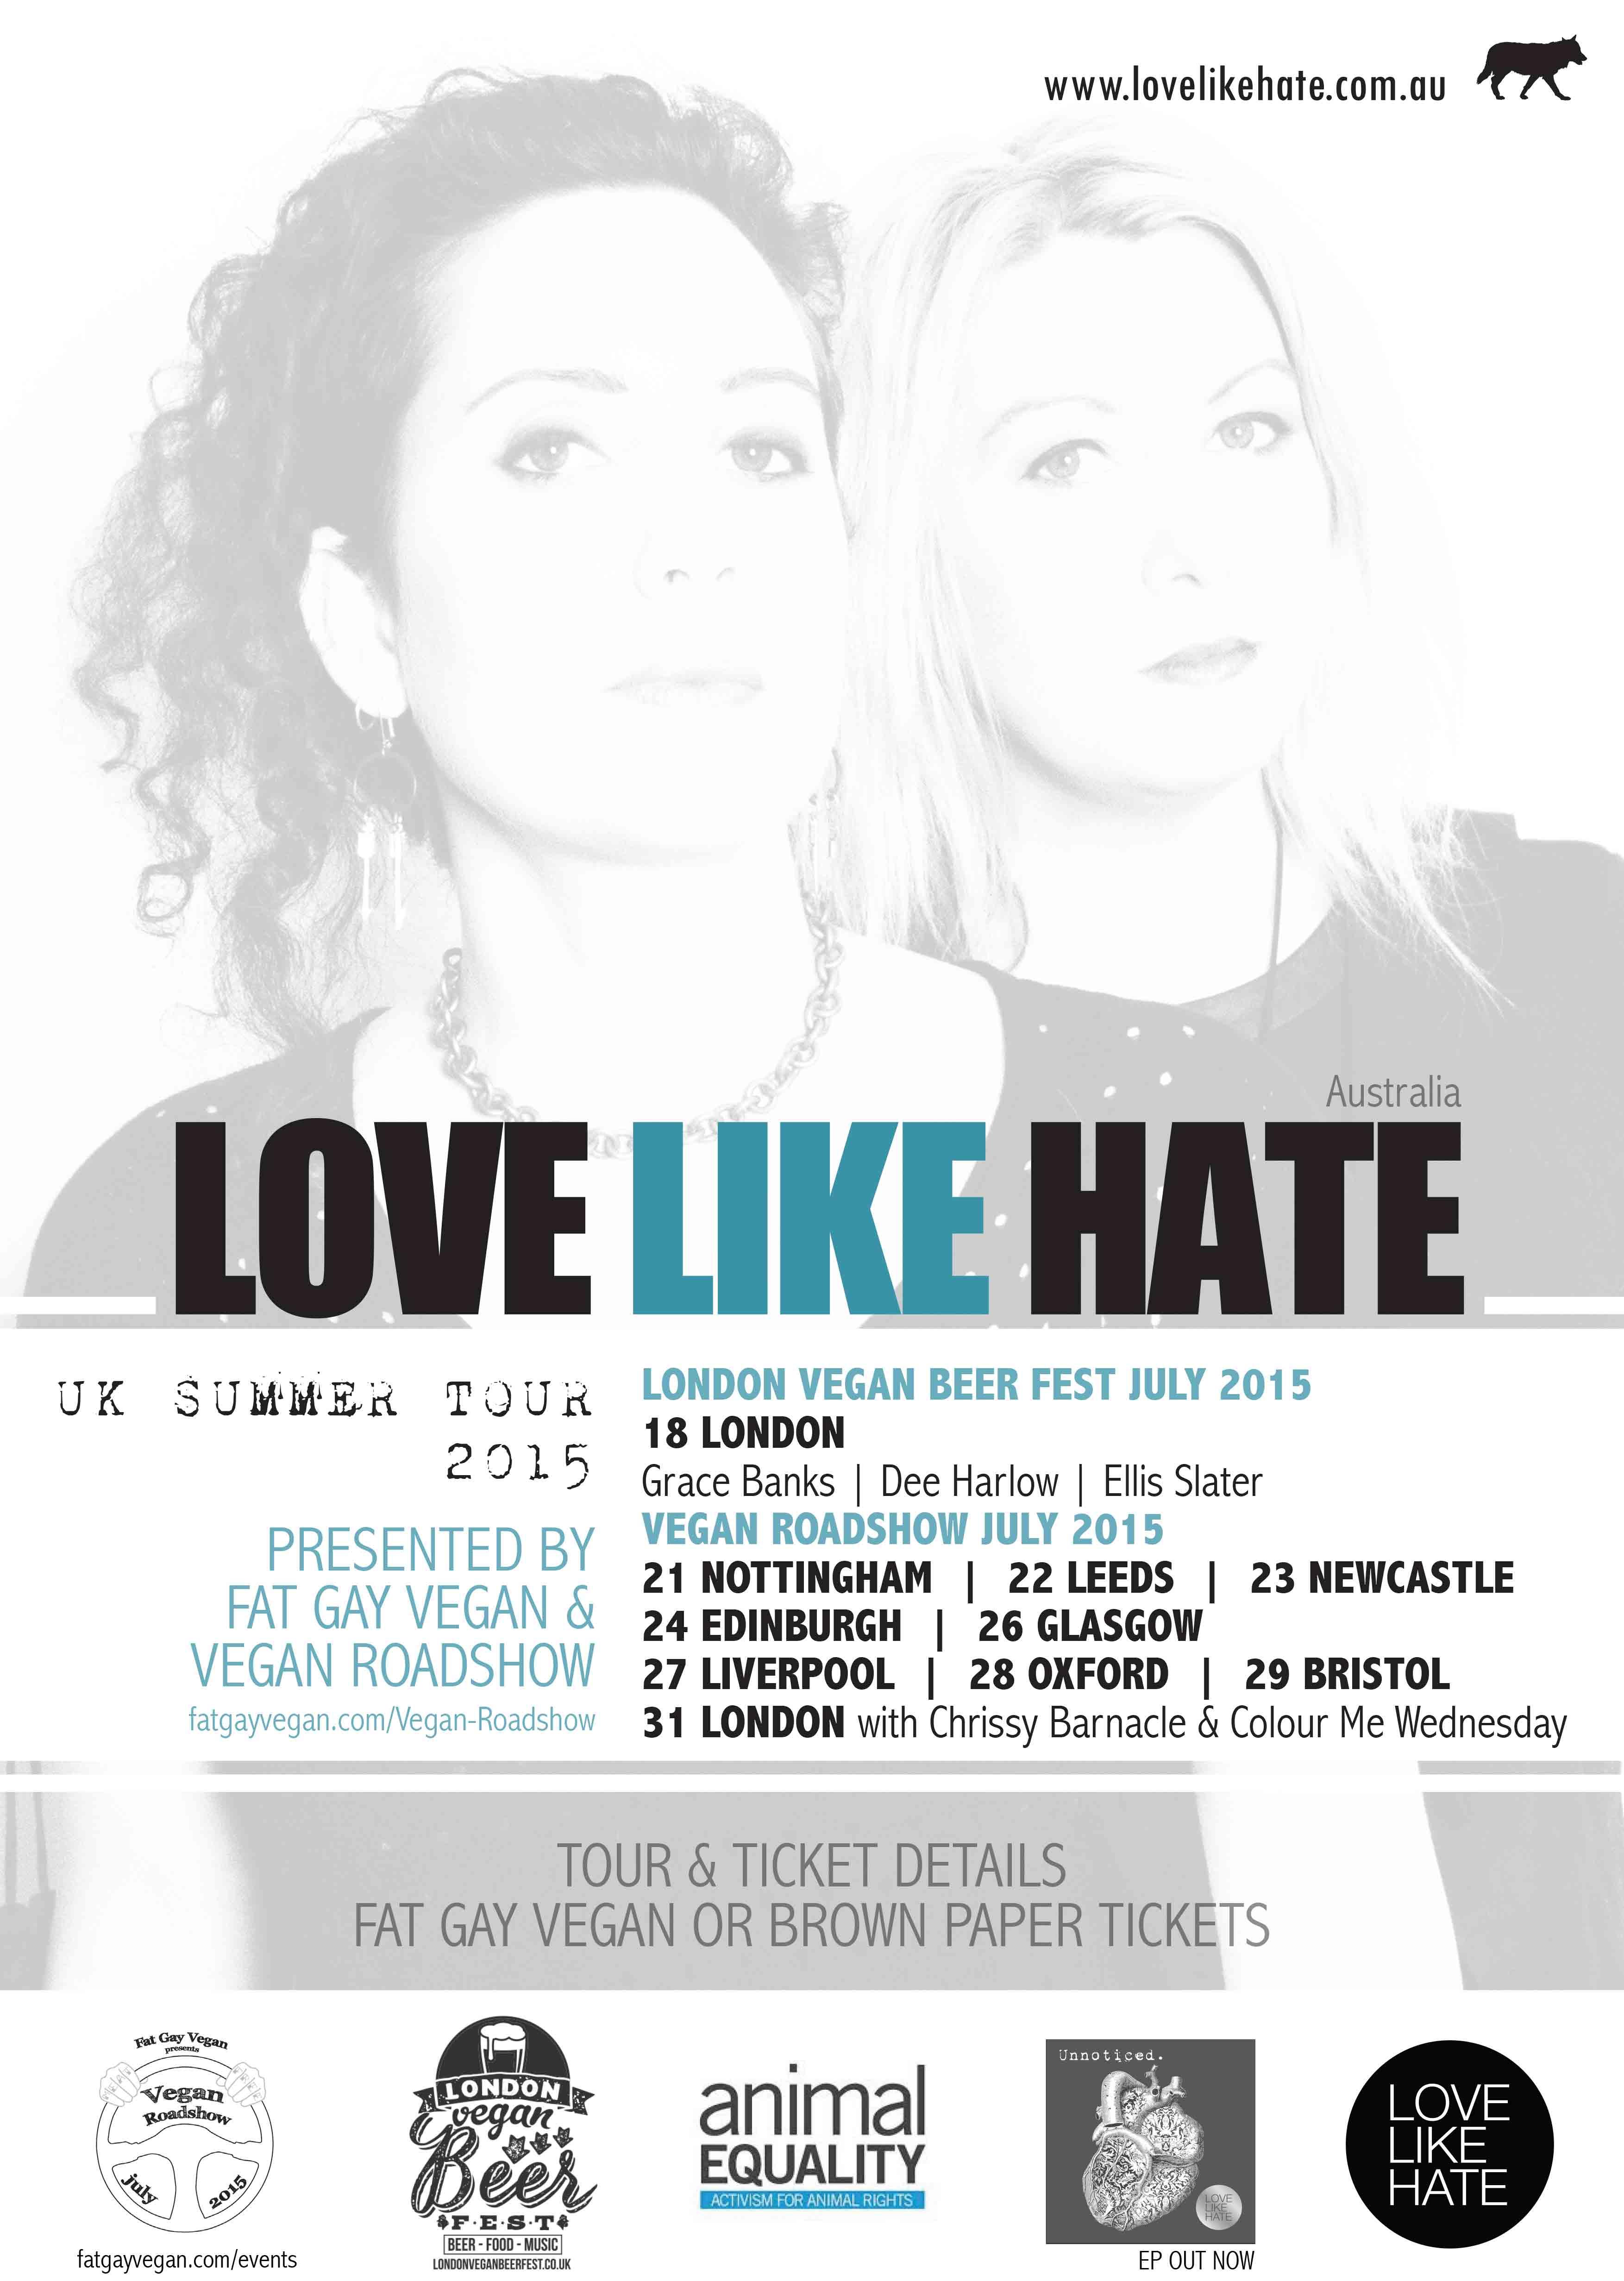 https://i1.wp.com/fatgayvegan.com/wp-content/uploads/2015/04/LoveLikeHate-2015-Tour-UK-21.jpg?fit=3507%2C4925